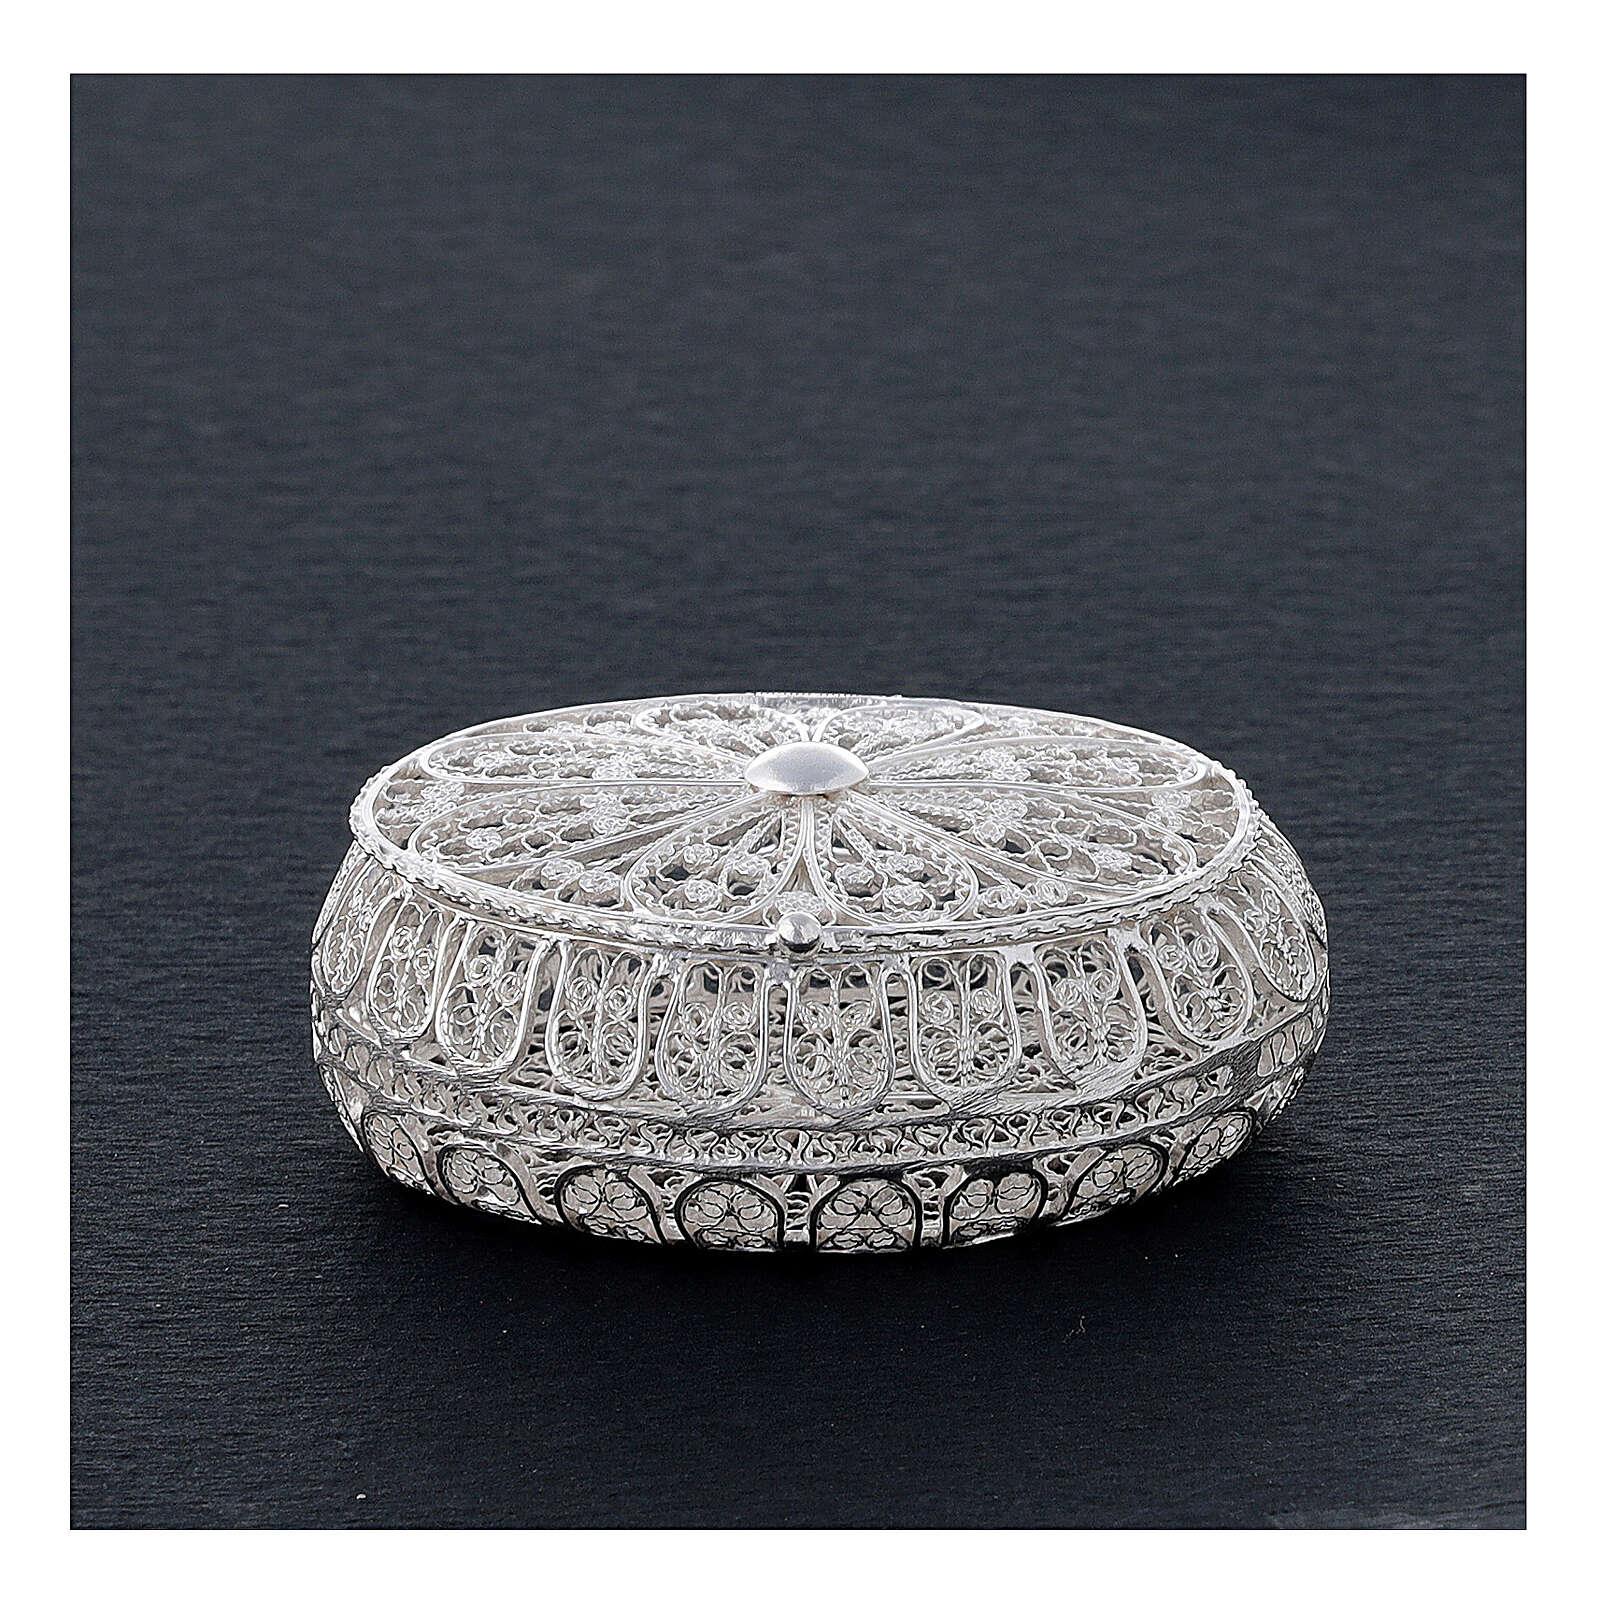 Caixa oval para terço filigrana prata 800 2x5,5x4,5 cm 4